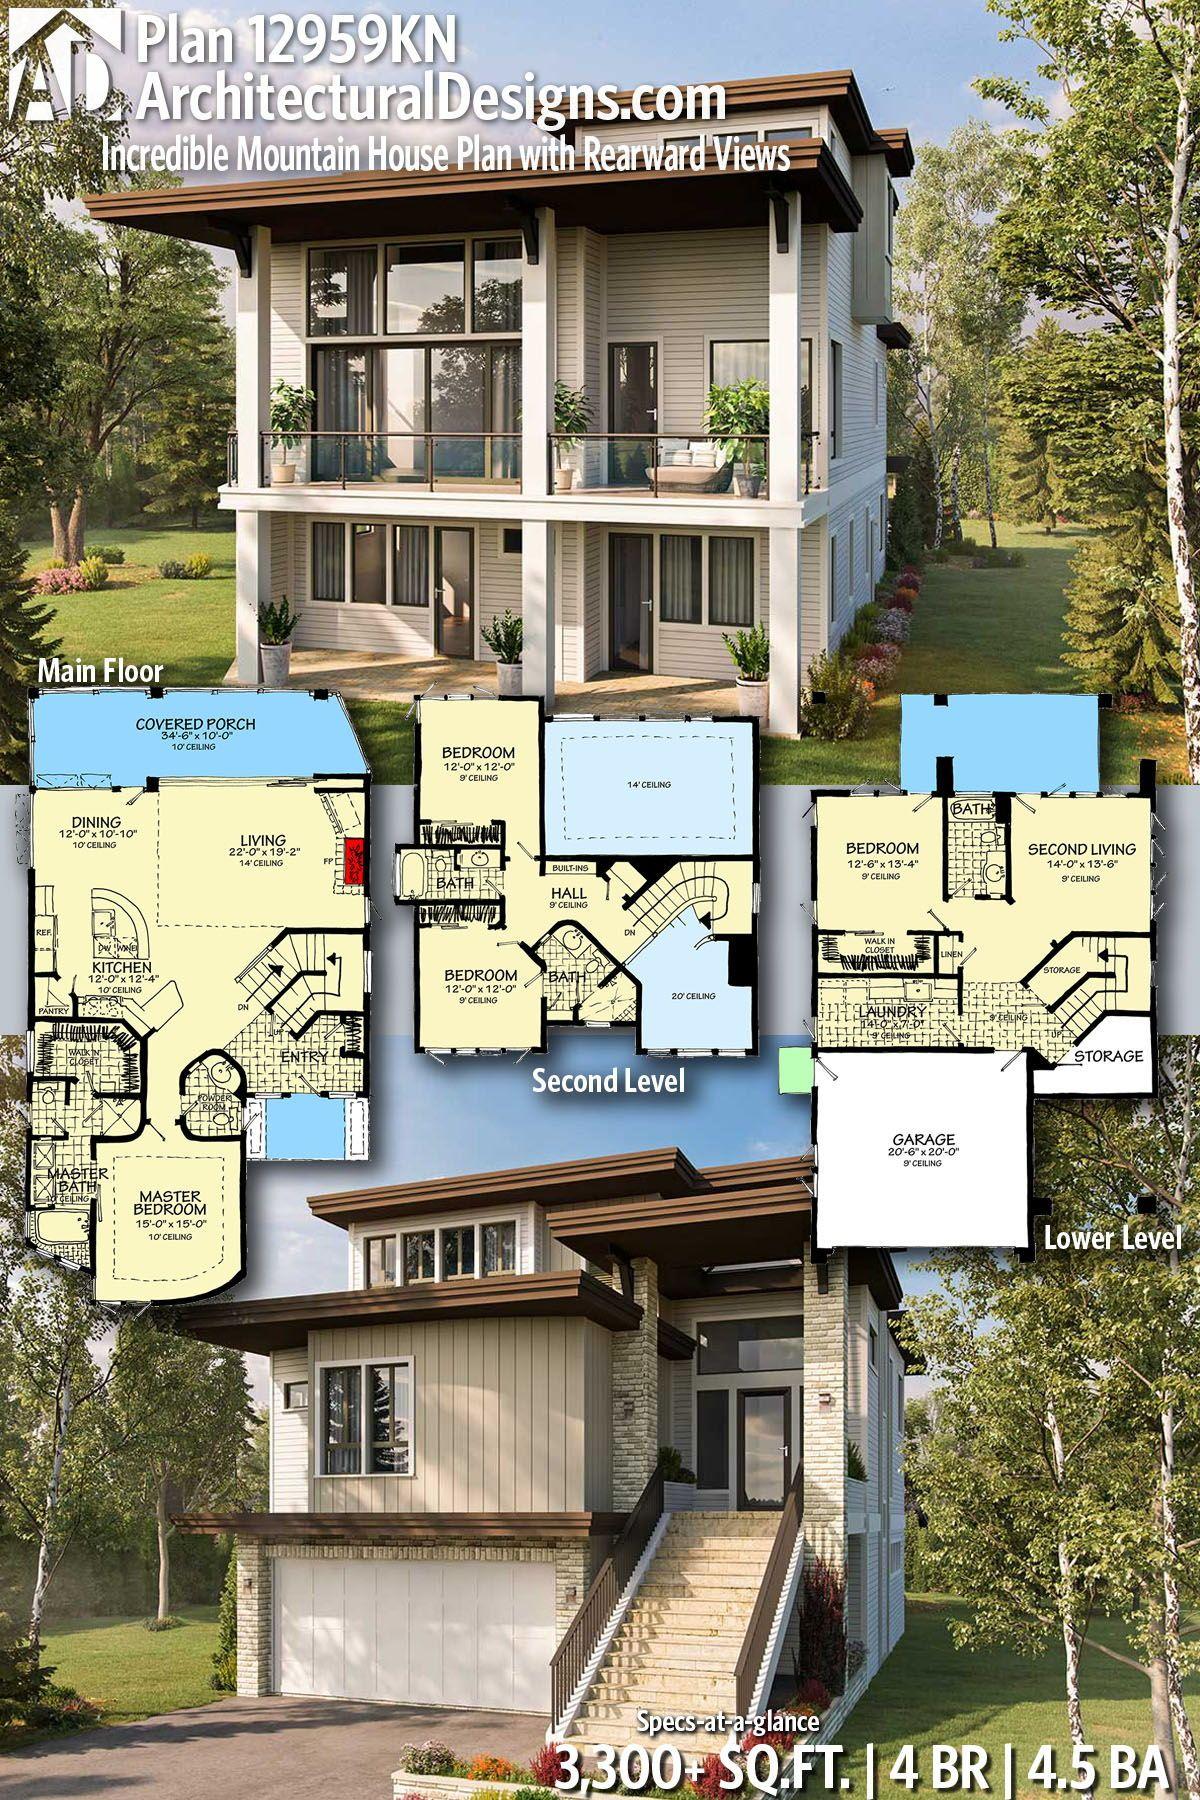 Plan 12959kn Incredible Mountain House Plan With Rearward Views